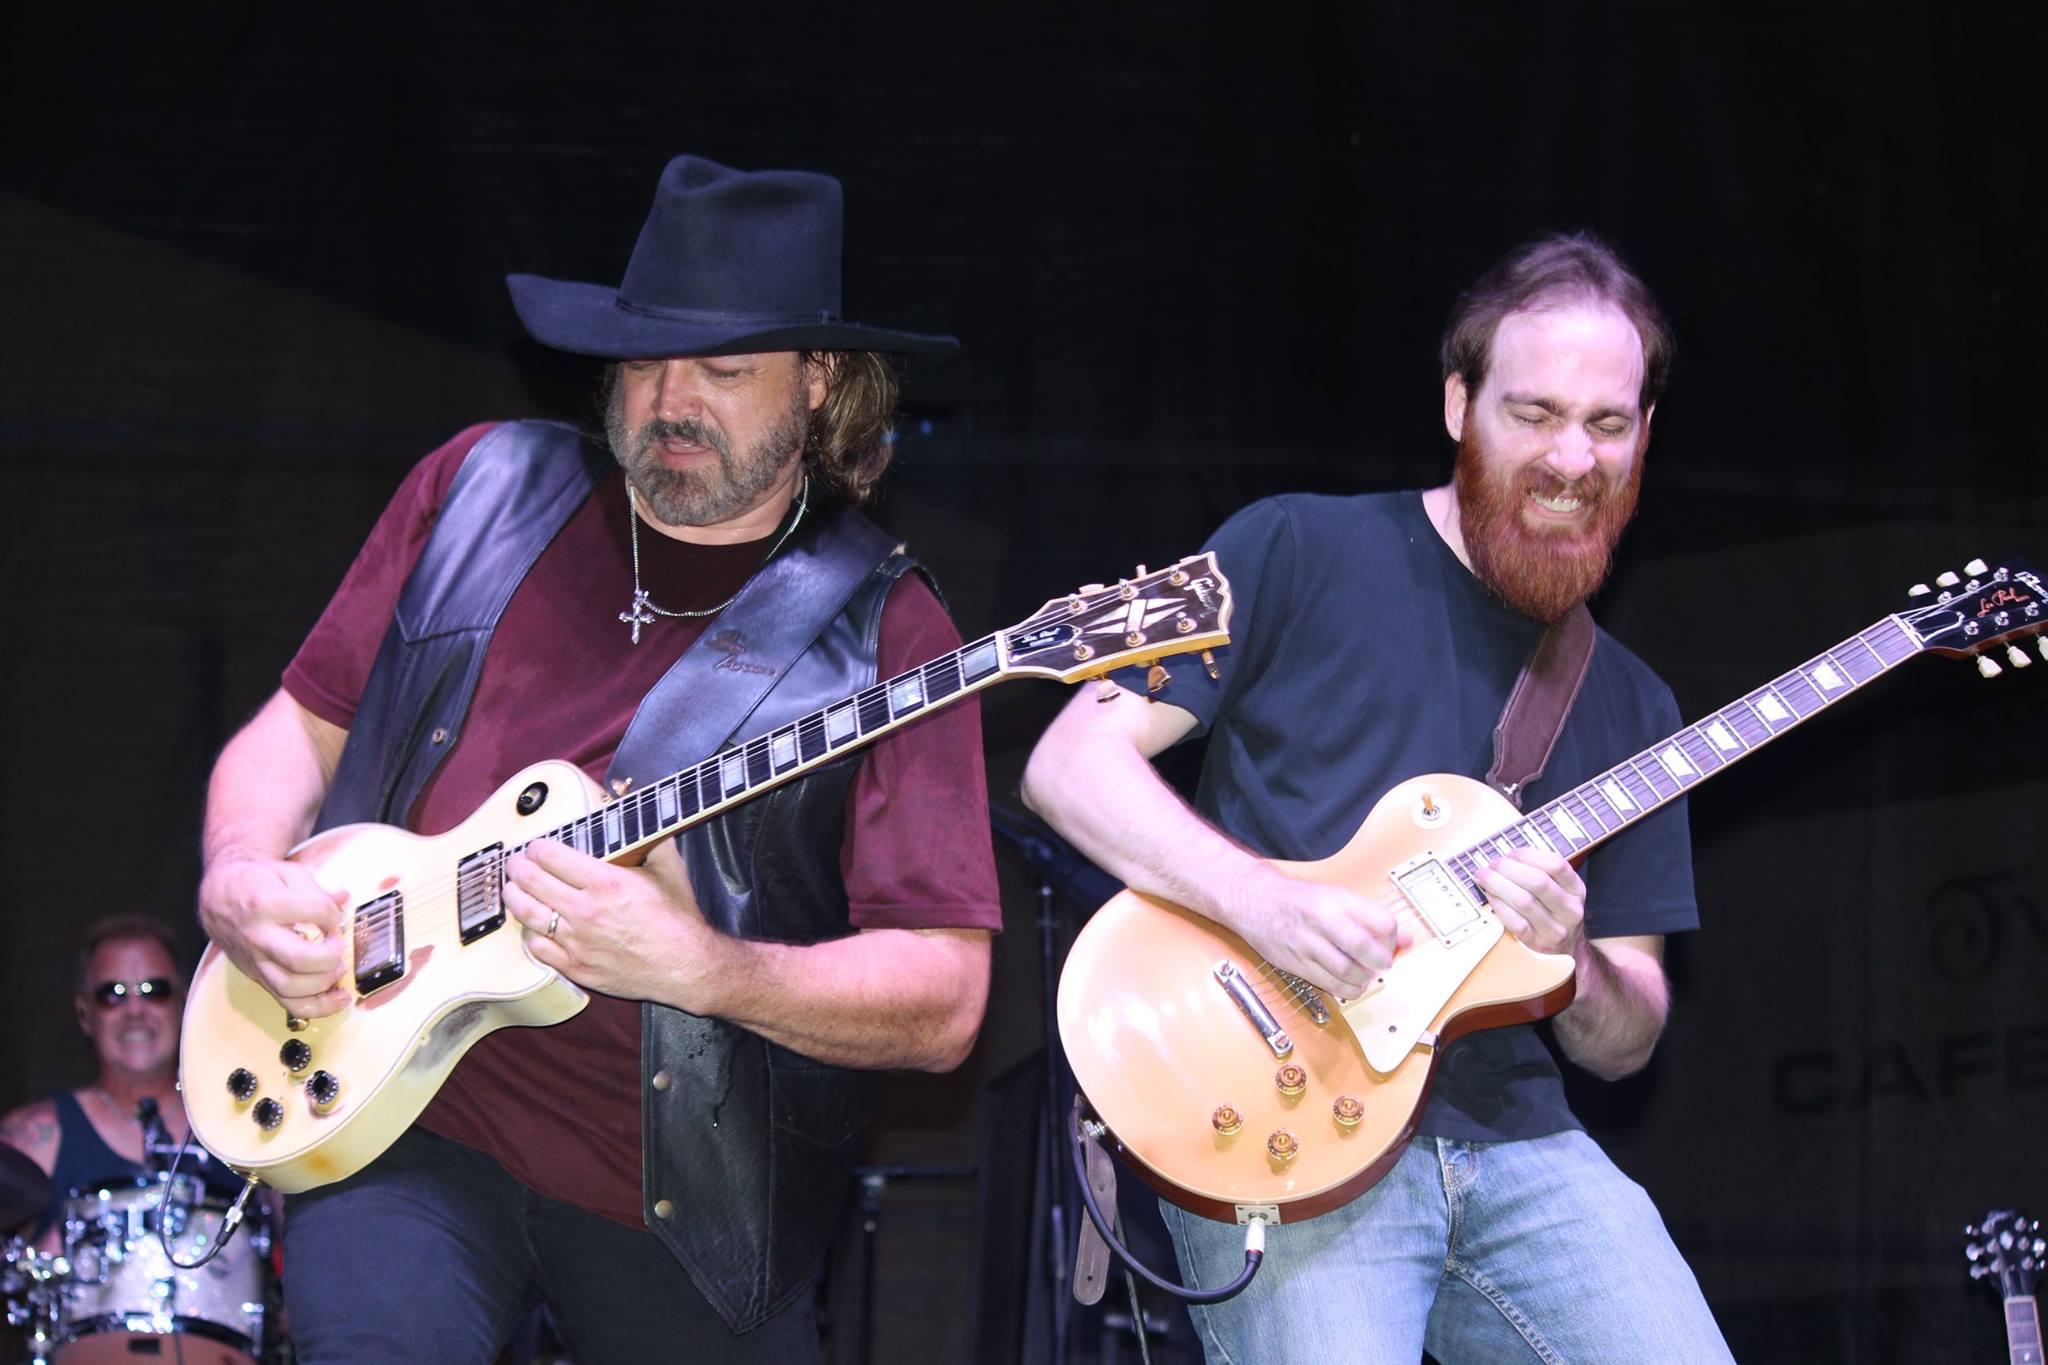 Sam Morrison and David Kurtz